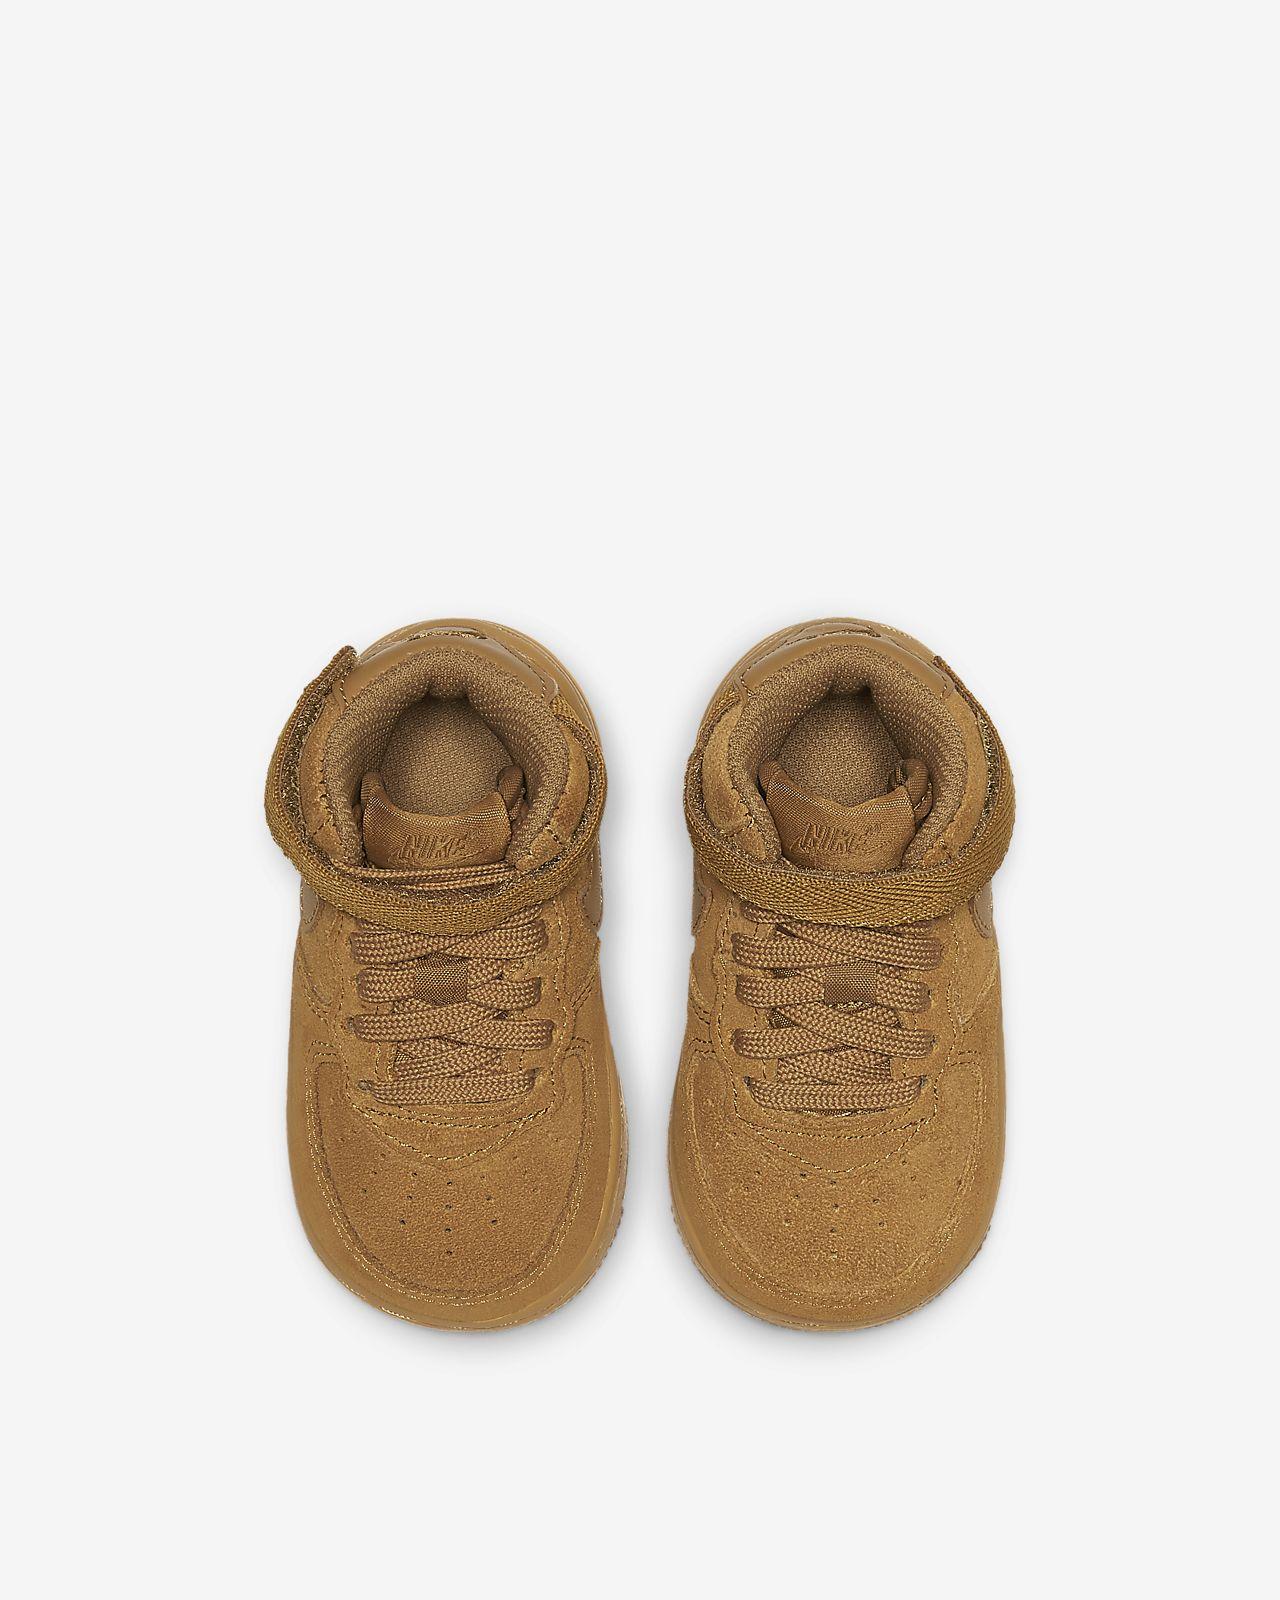 Nike Force 1 Mid LV8 3 BabyToddler Shoe